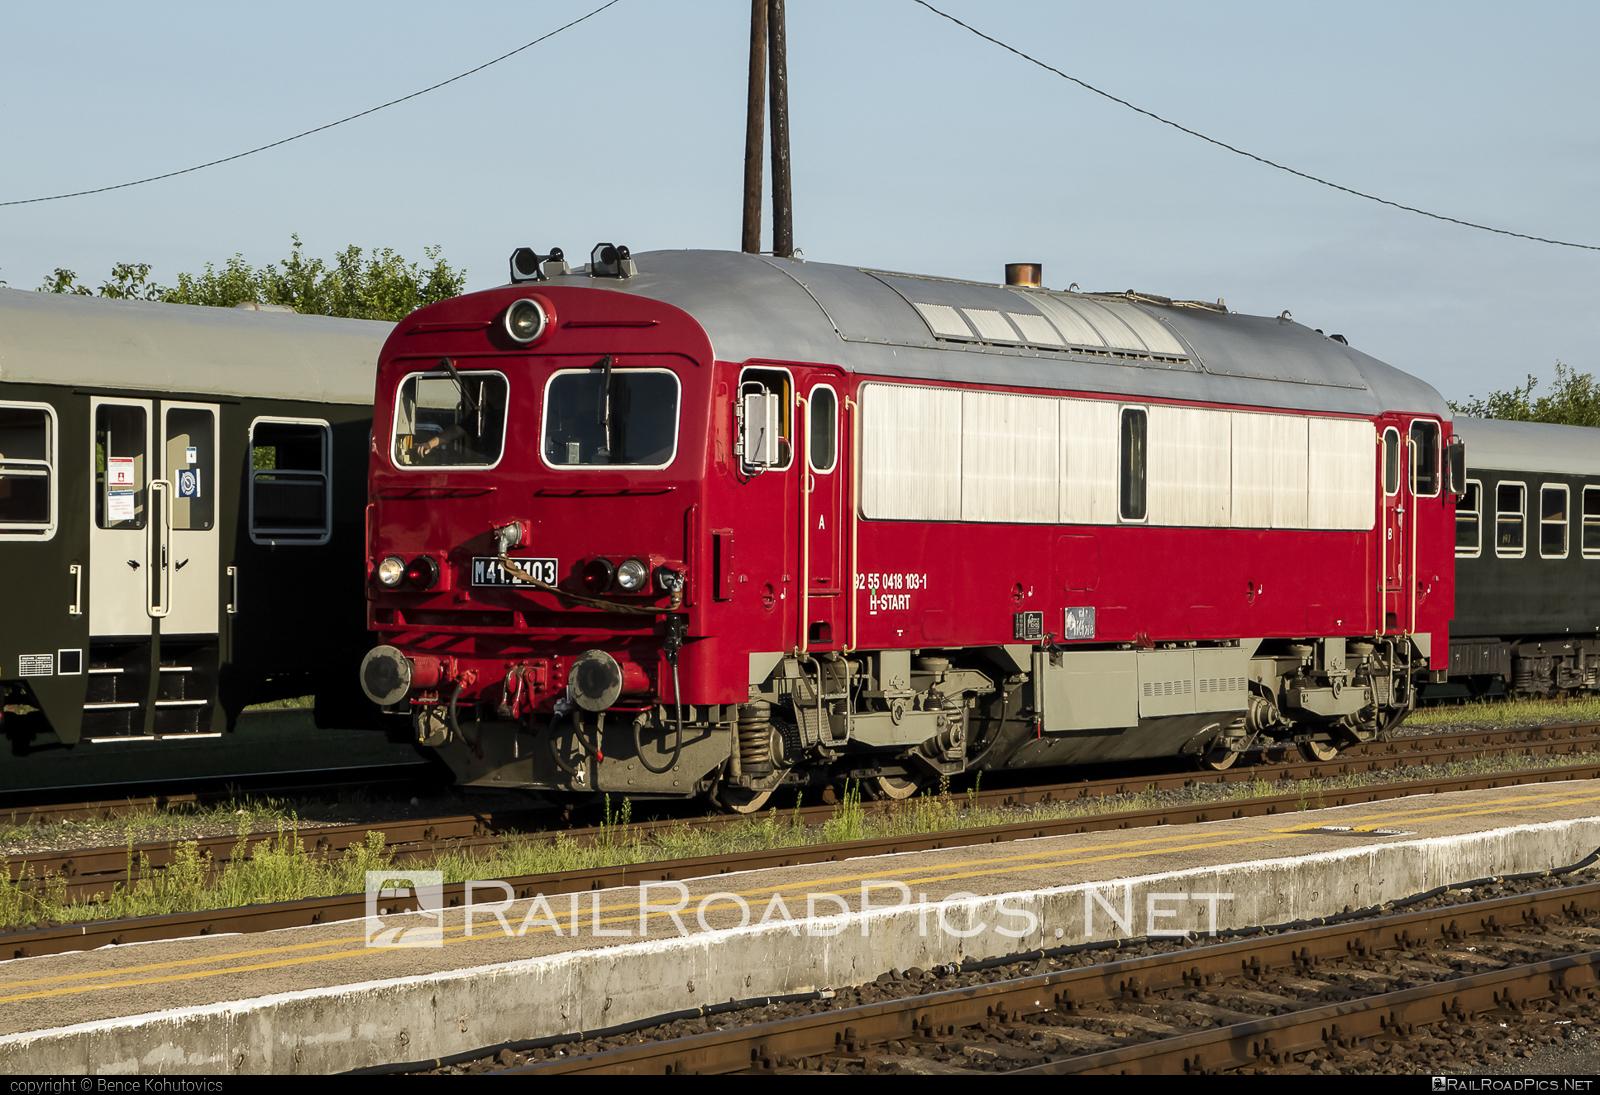 Ganz-MÁVAG DHM7-1 - 418 103 operated by MÁV-START ZRt. #dhm7 #dhm71 #ganzm41 #ganzmavag #ganzmavag418 #ganzmavagdhm7 #ganzmavagdhm71 #ganzmavagm41 #m41locomotive #mav #mavstart #mavstartzrt